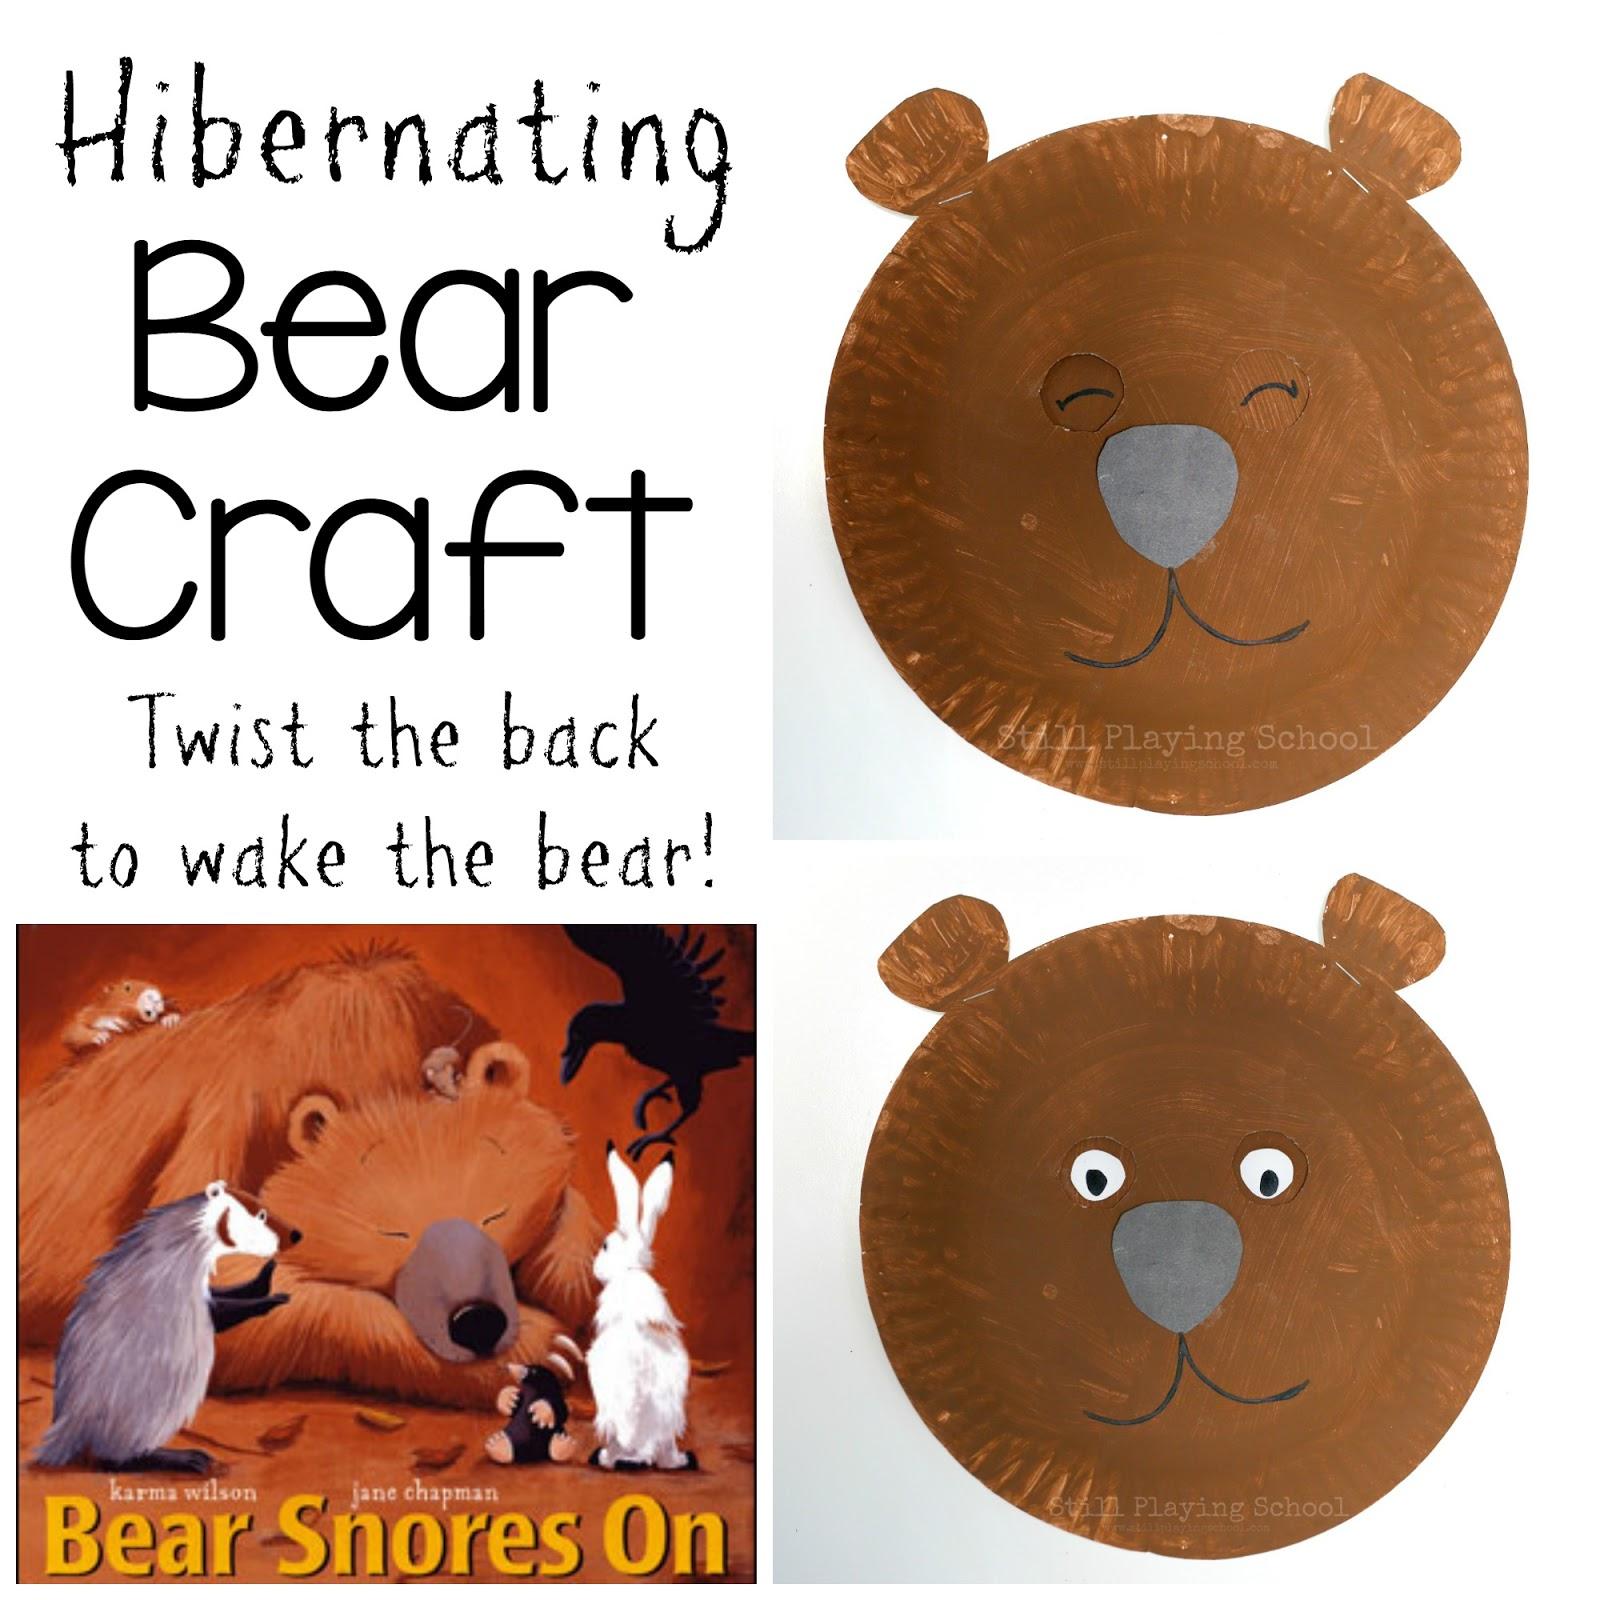 Hibernating bear craft for kids still playing school for Hibernation crafts for kids